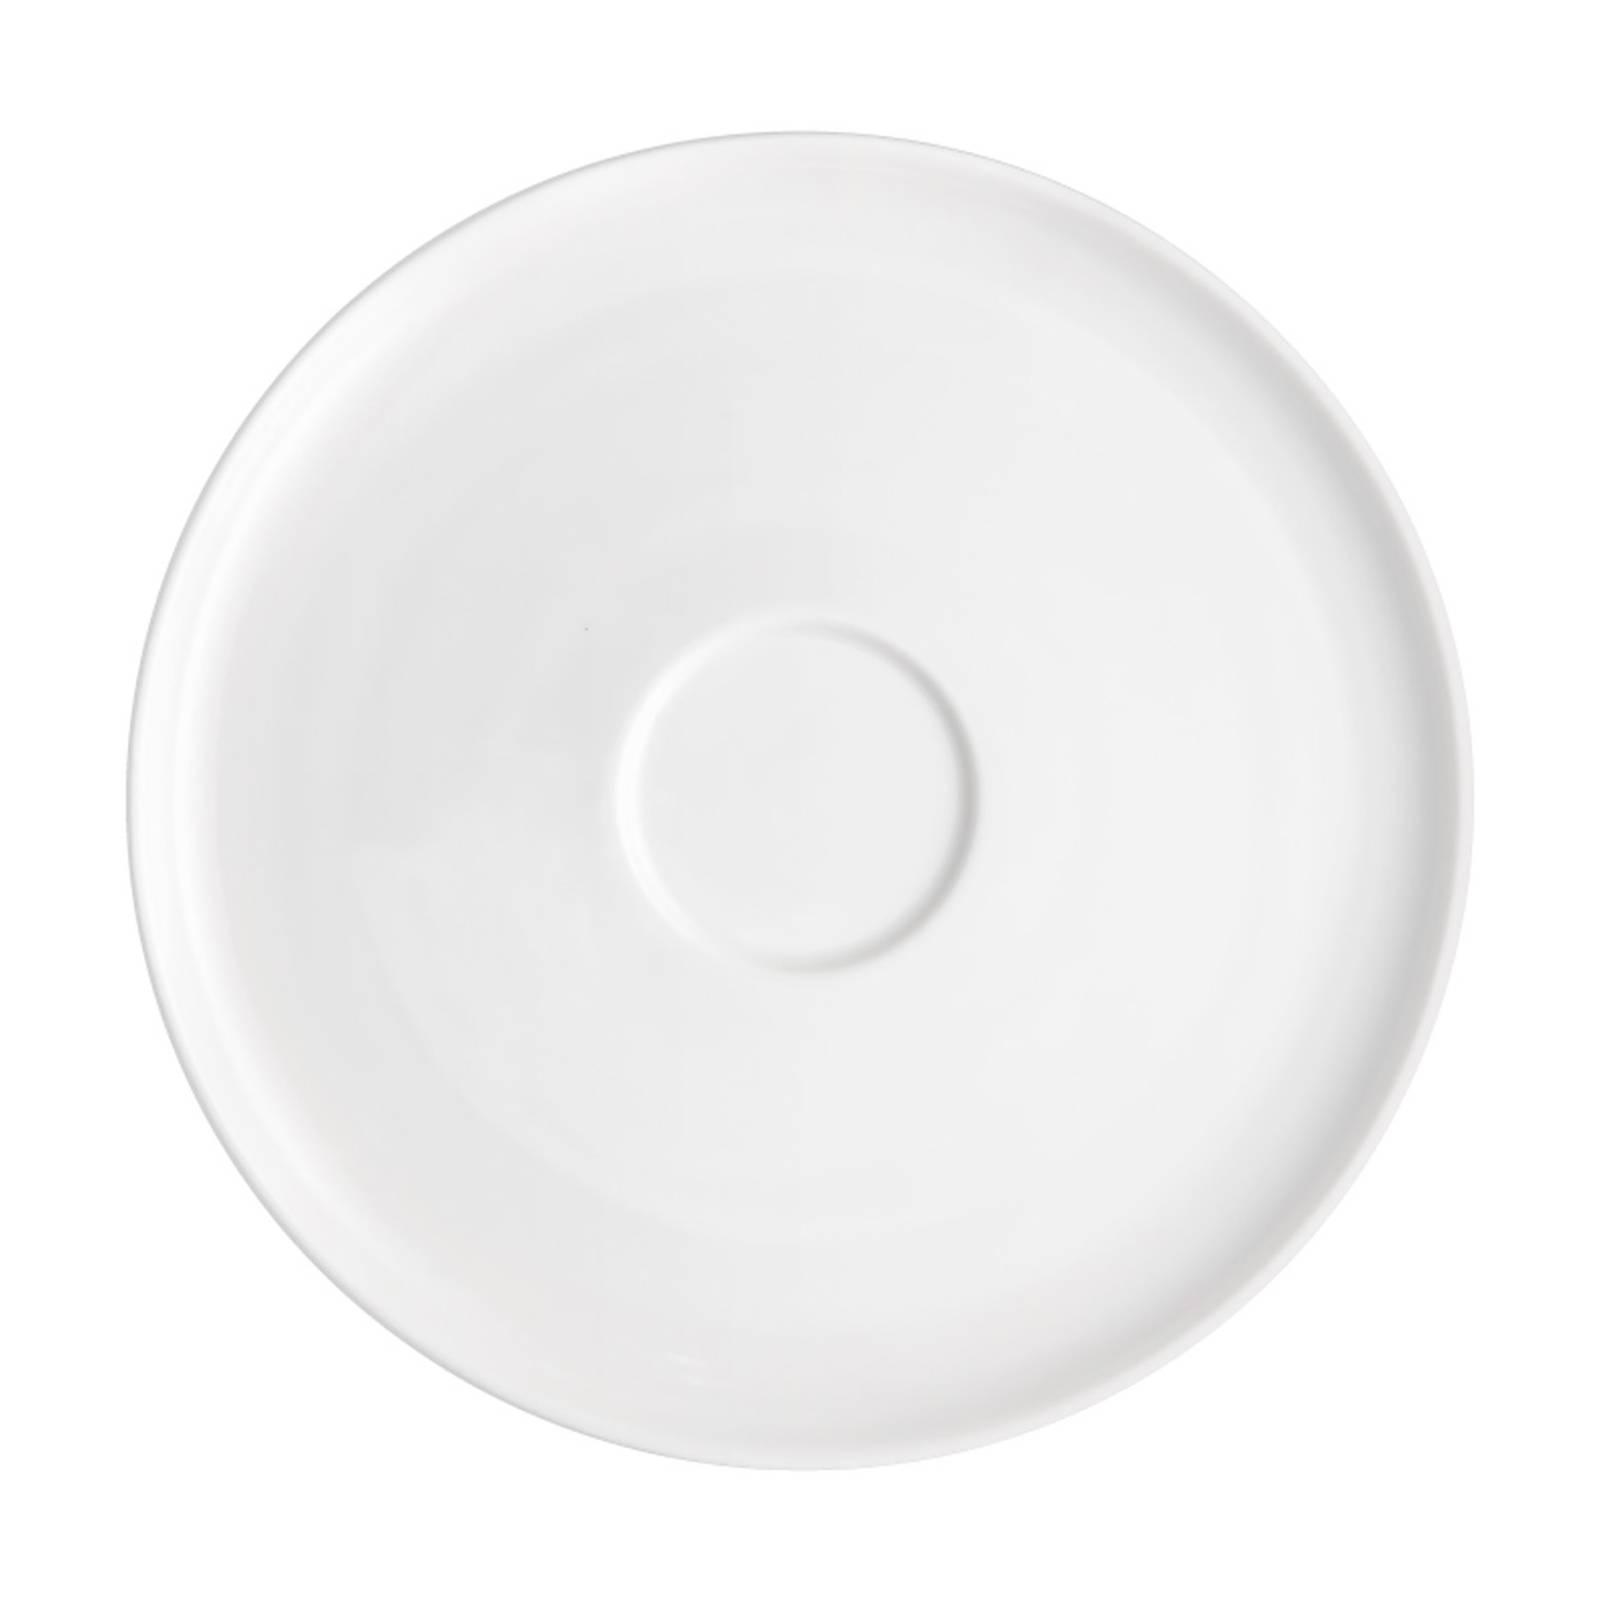 Saucer Salsa 15 cm AMBITION